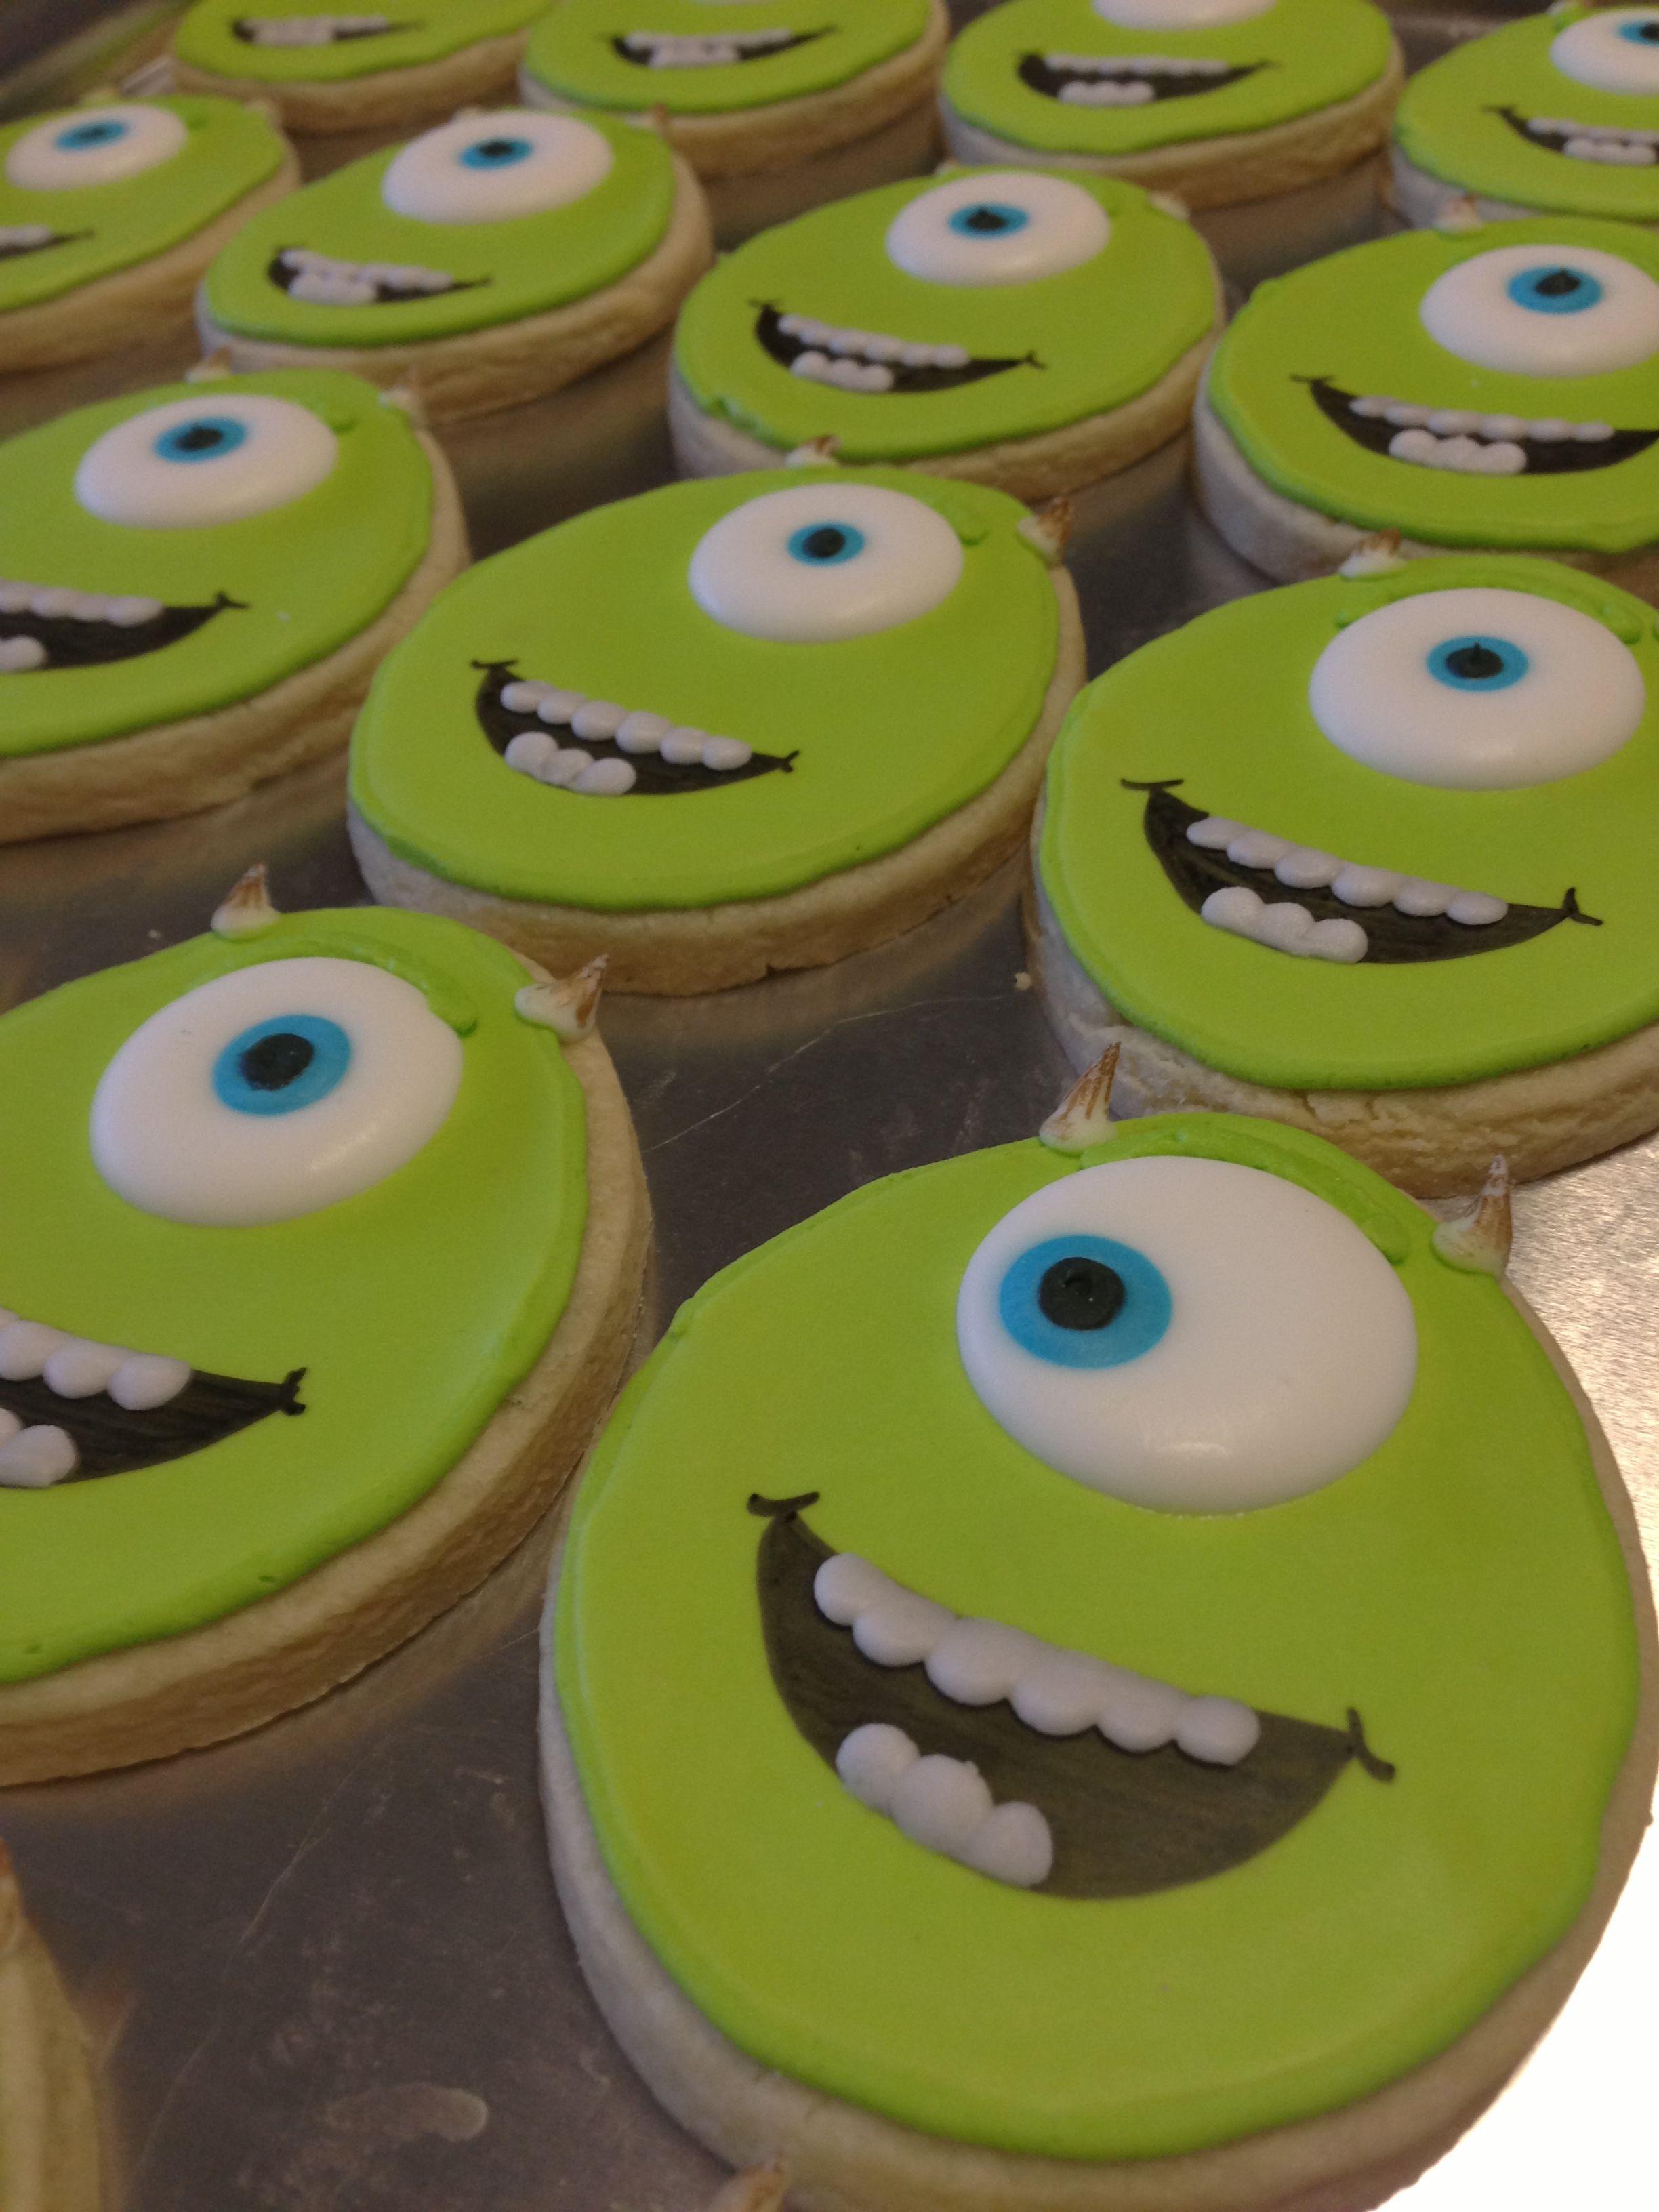 mike cookies from monsters inc cupcakes pinterest backen und torten. Black Bedroom Furniture Sets. Home Design Ideas